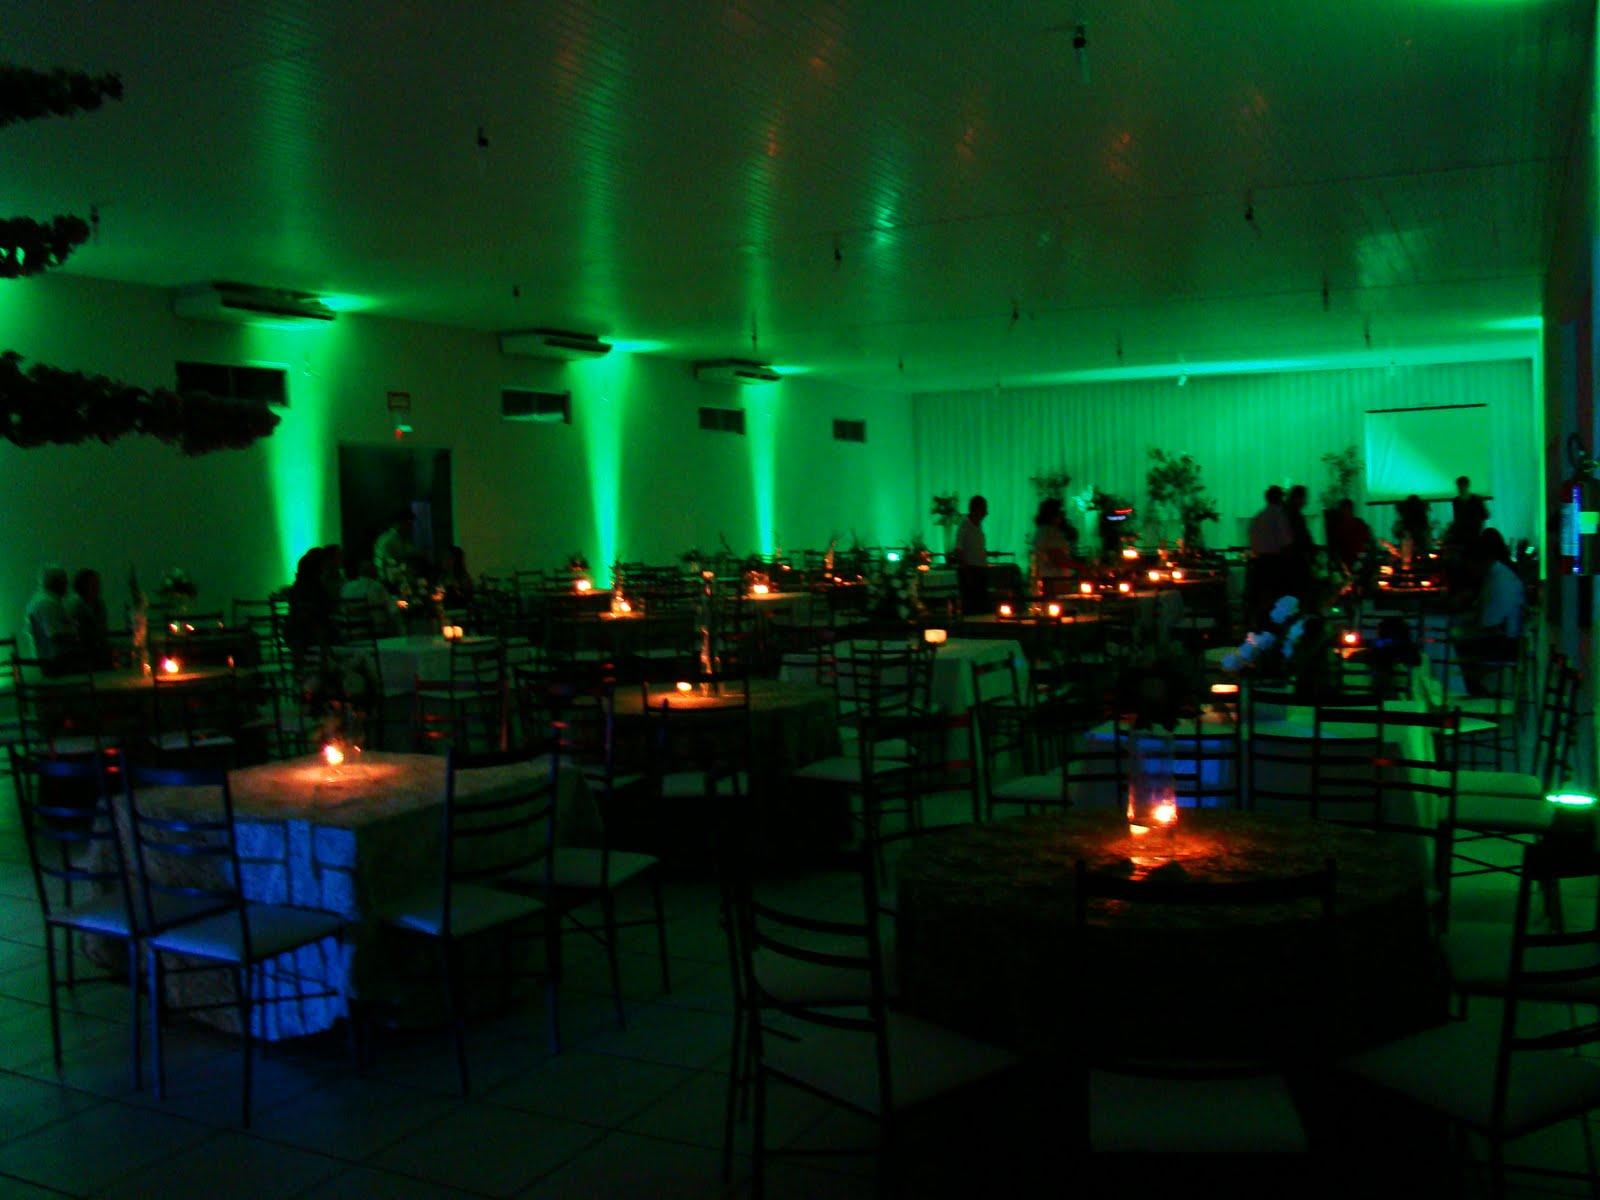 Paulo minga luz de arquitetura - Luces de ambiente ...